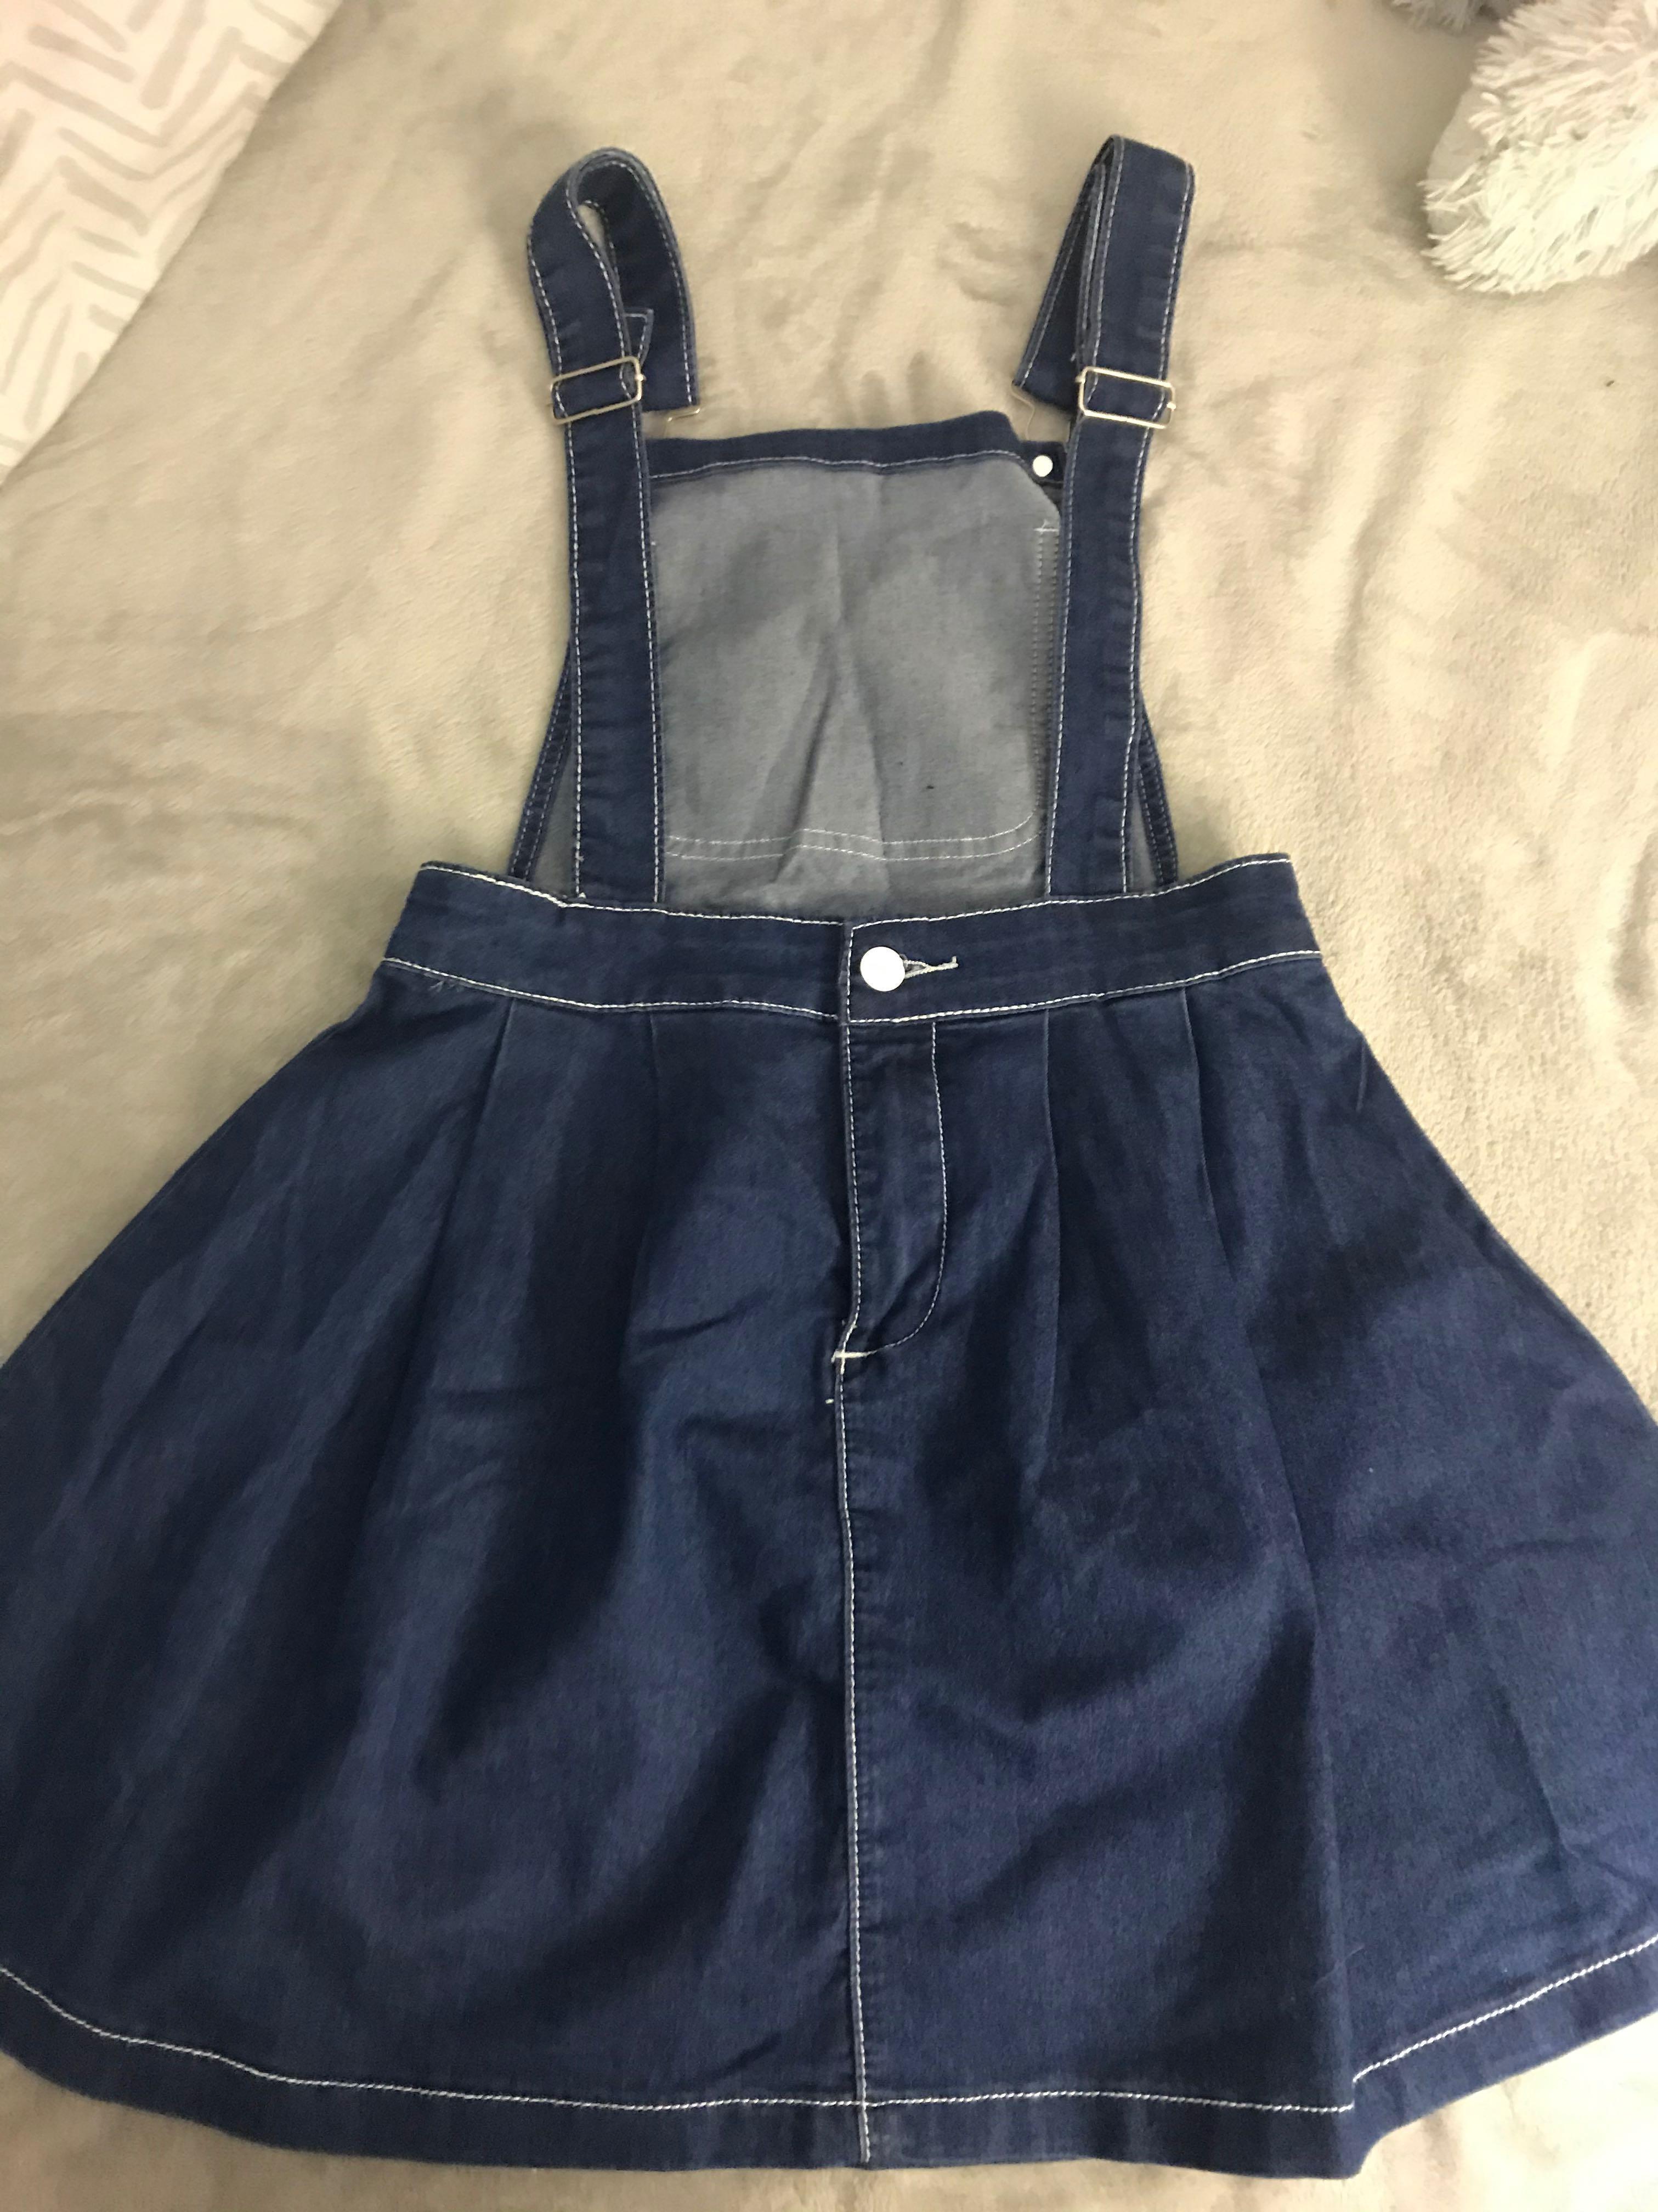 Cute Overalls Dress!!